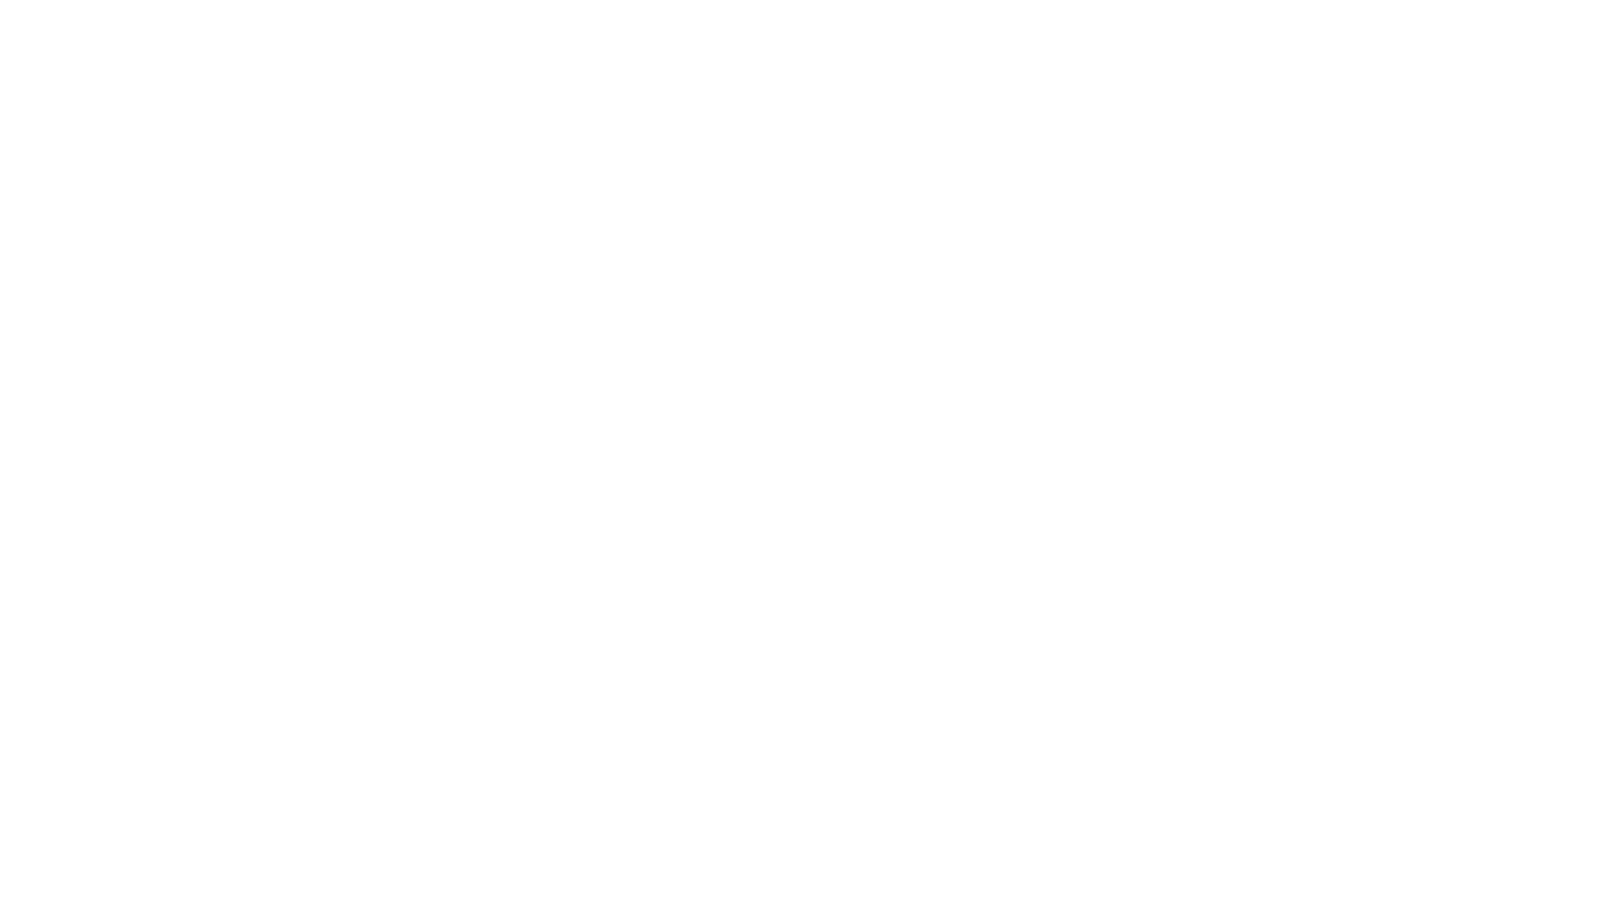 00:00 - Начало 00:55 - Проблемы которые решаем 02:07 - Total Adressable Market 02:23 - Serviceable Adressable Market 02:37 - Serviceable Obtainle Market 03:04 - Наши конкуренты 03:12 - Монетизация и бизнес модель 03:31 - План маркетинга 04:09 - Наша команда 04:25 - Инвестиции